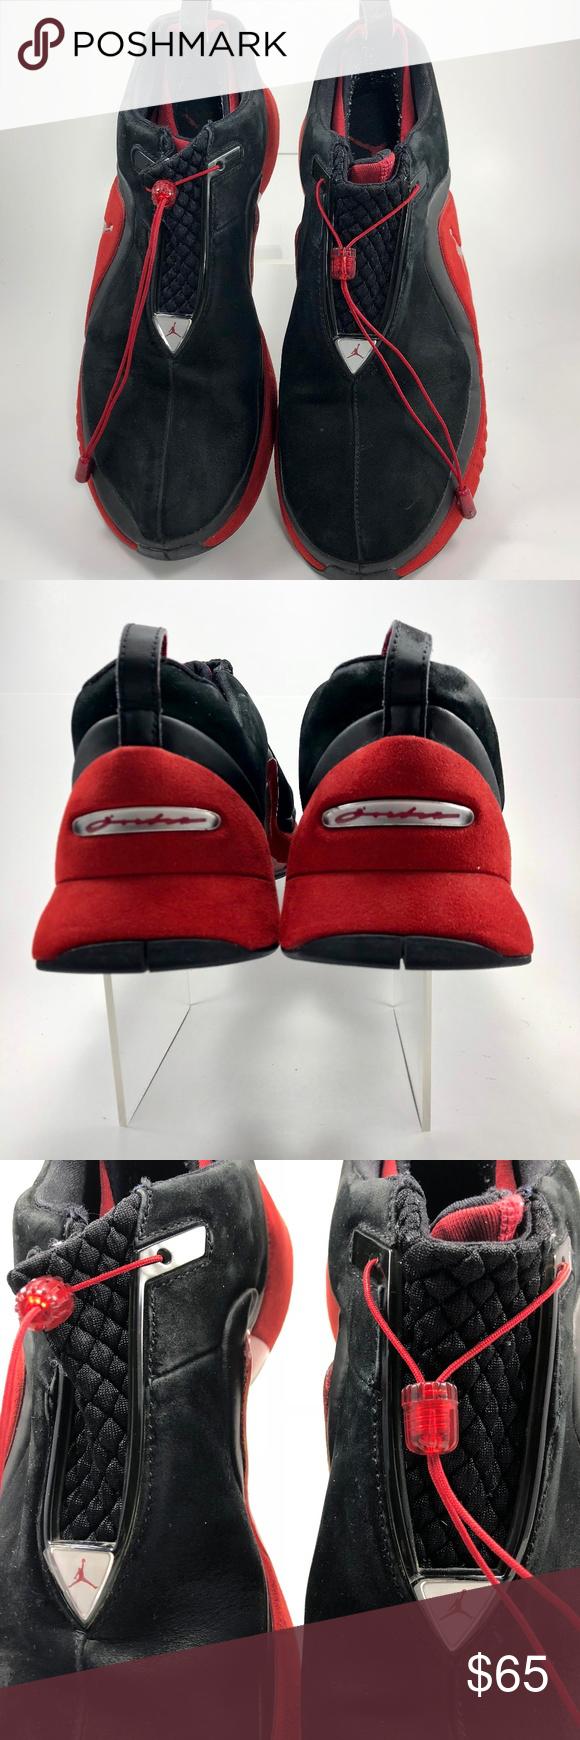 NikeTrunnerAttackMens RedBlack 307543006 Black and